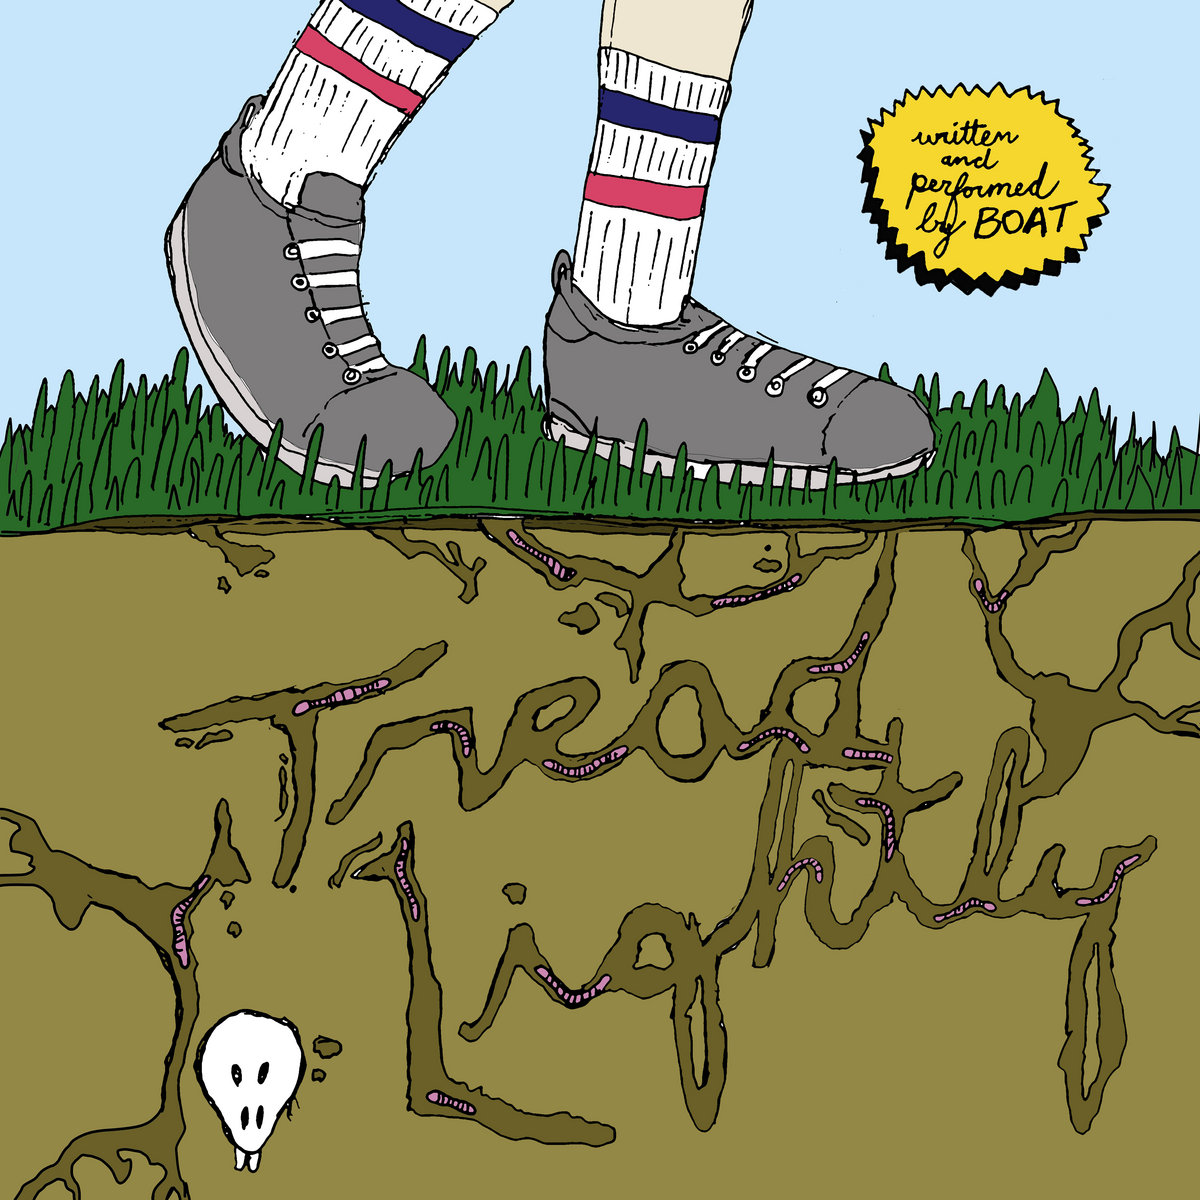 BOAT - Tread Lightly par K. Joslin et D. Crane